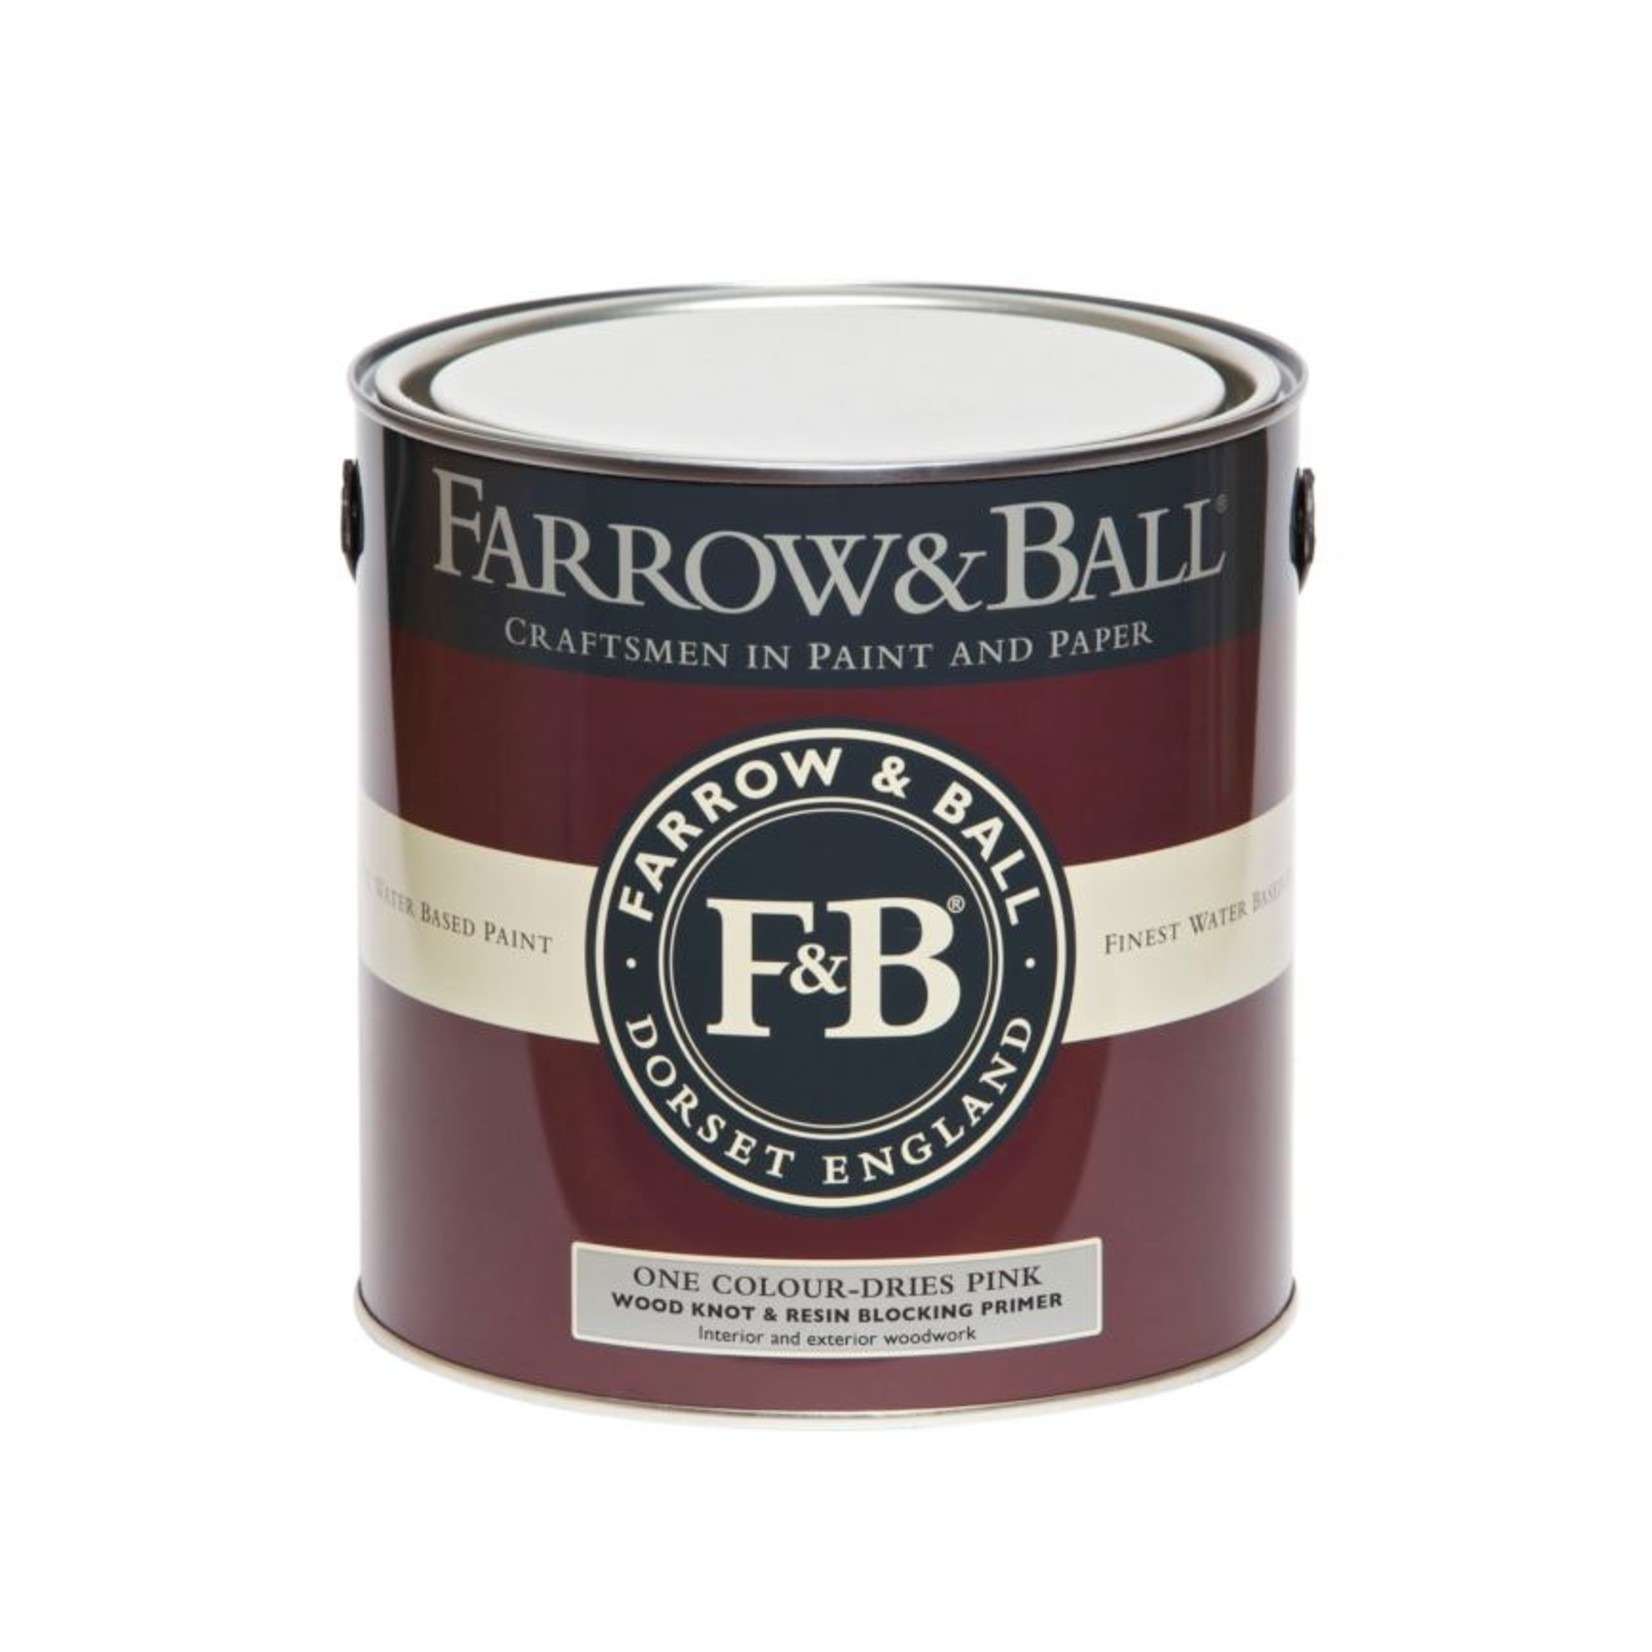 FARROW & BALL WOOD KNOT + RESIN BLOCKING PRIMER